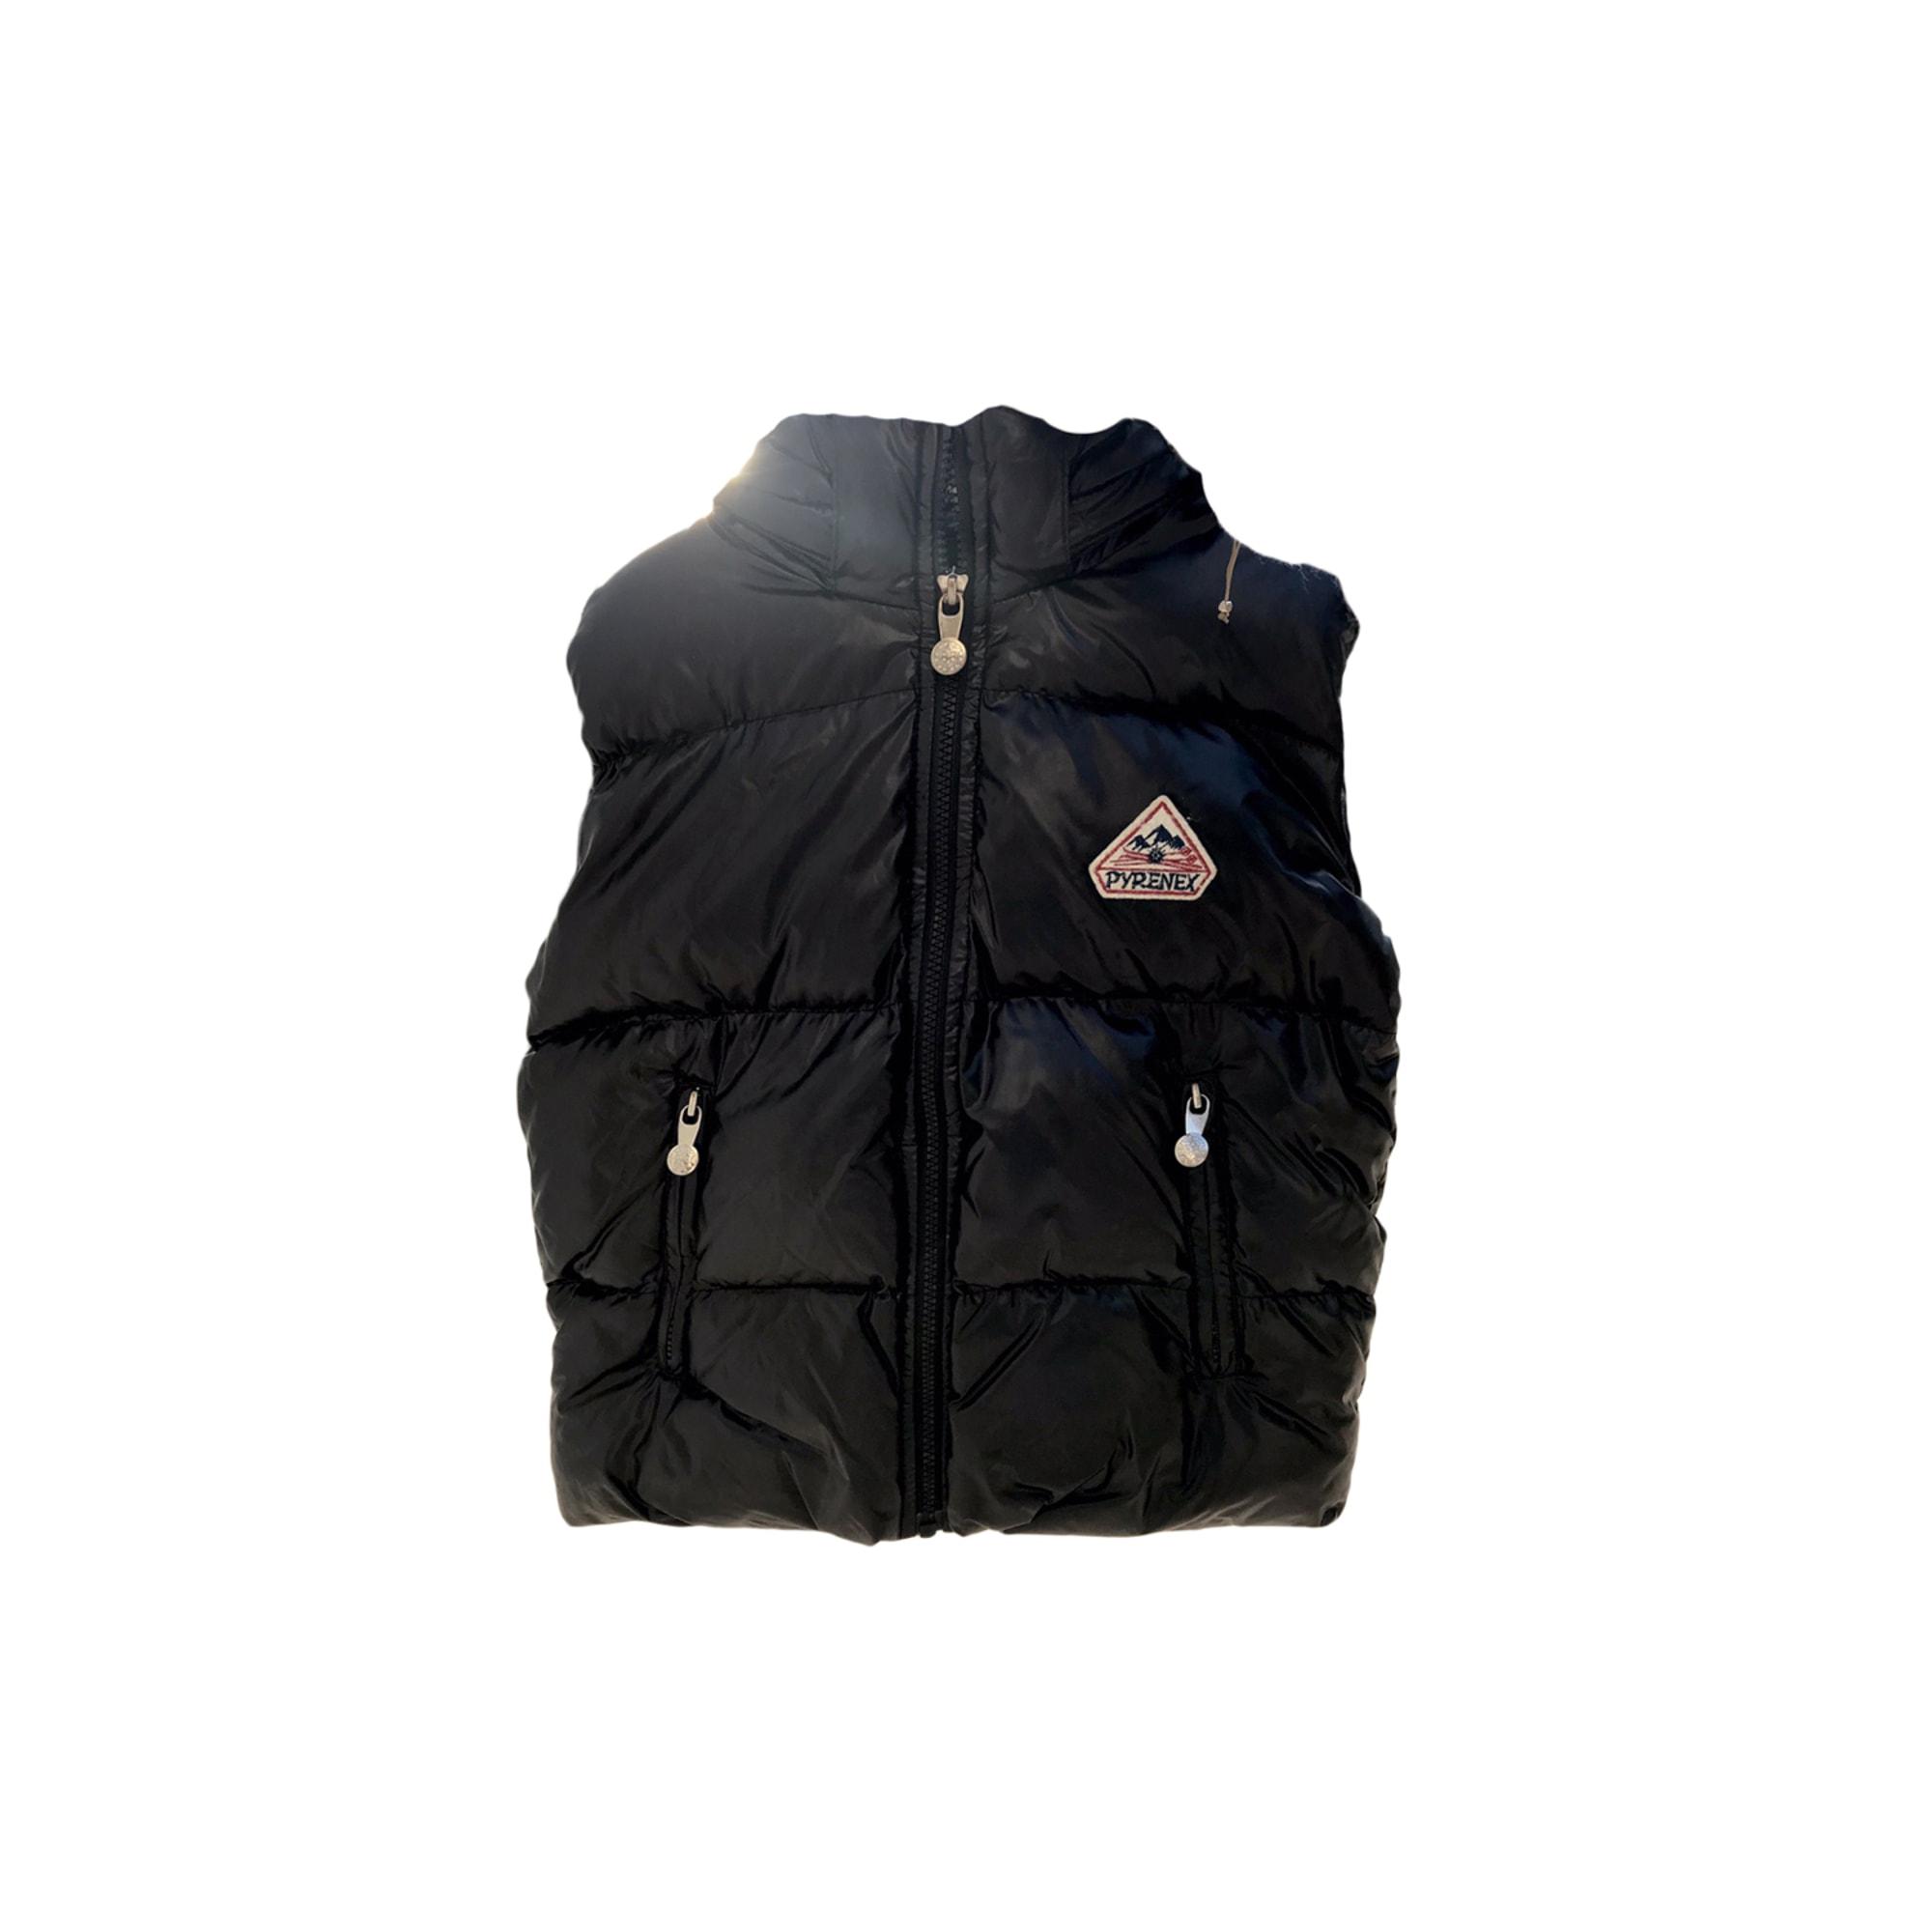 Down Jacket PYRENEX Black